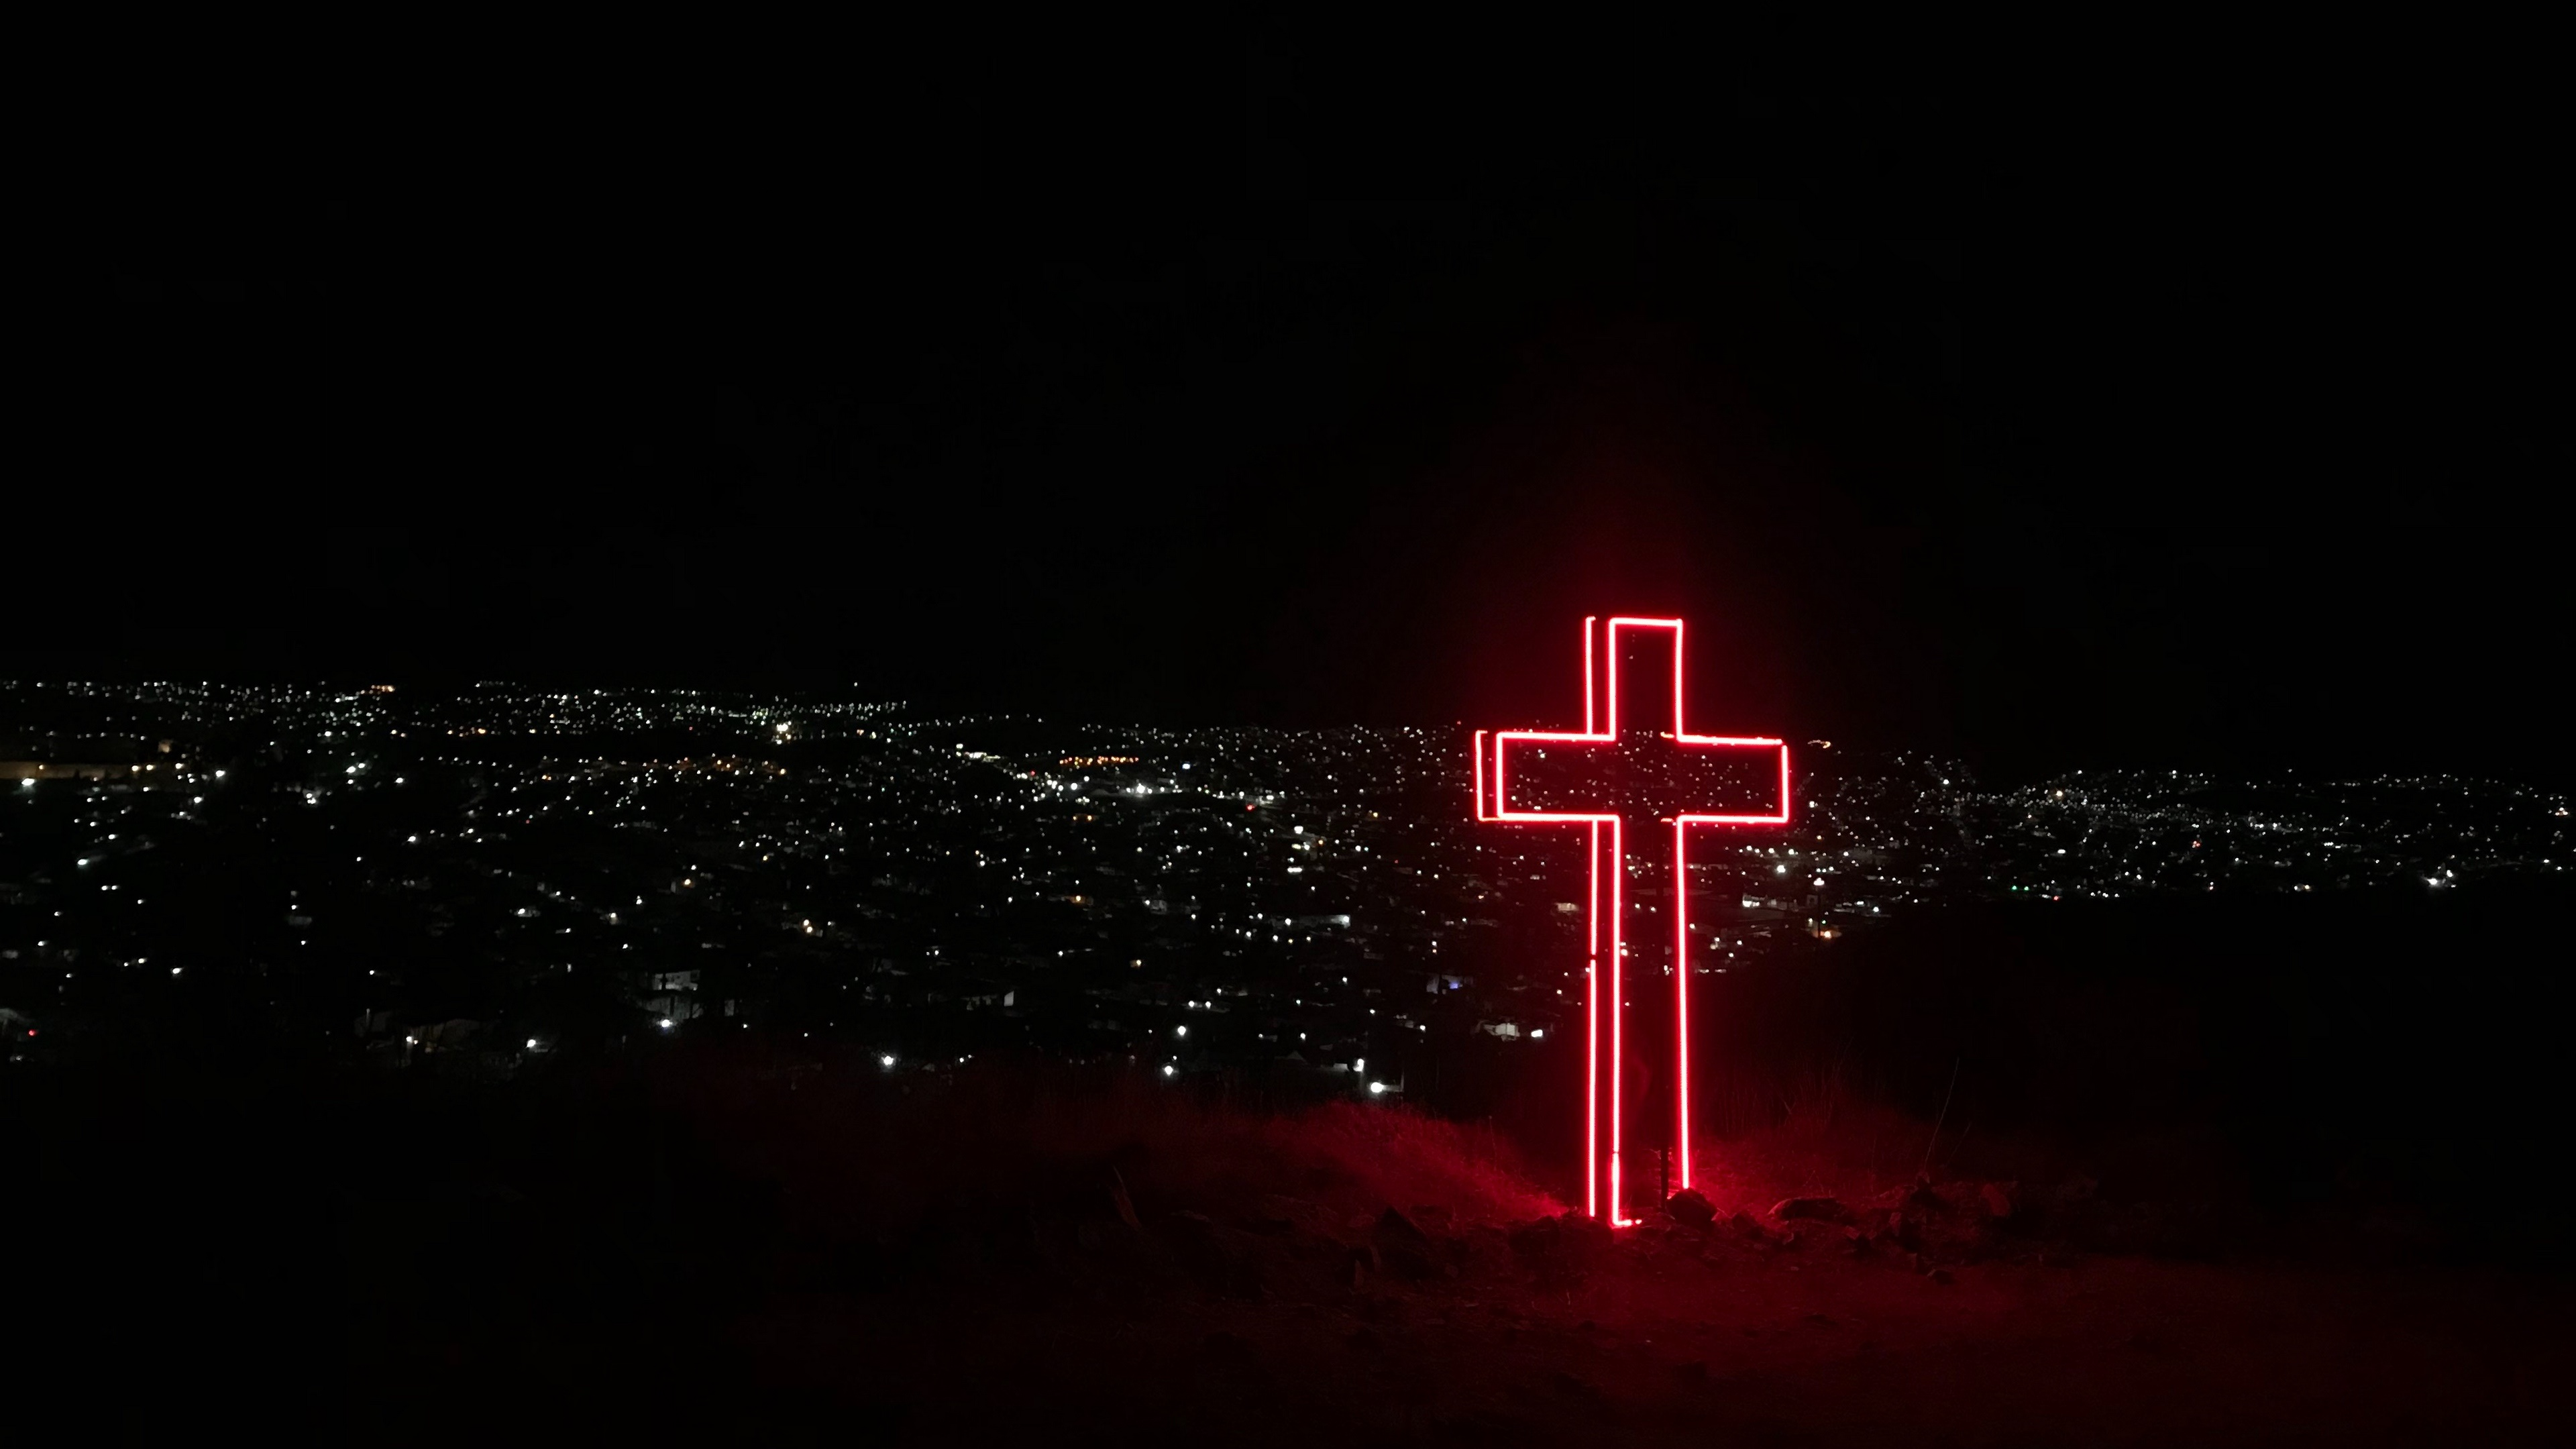 Red light cross above the city wallpaper